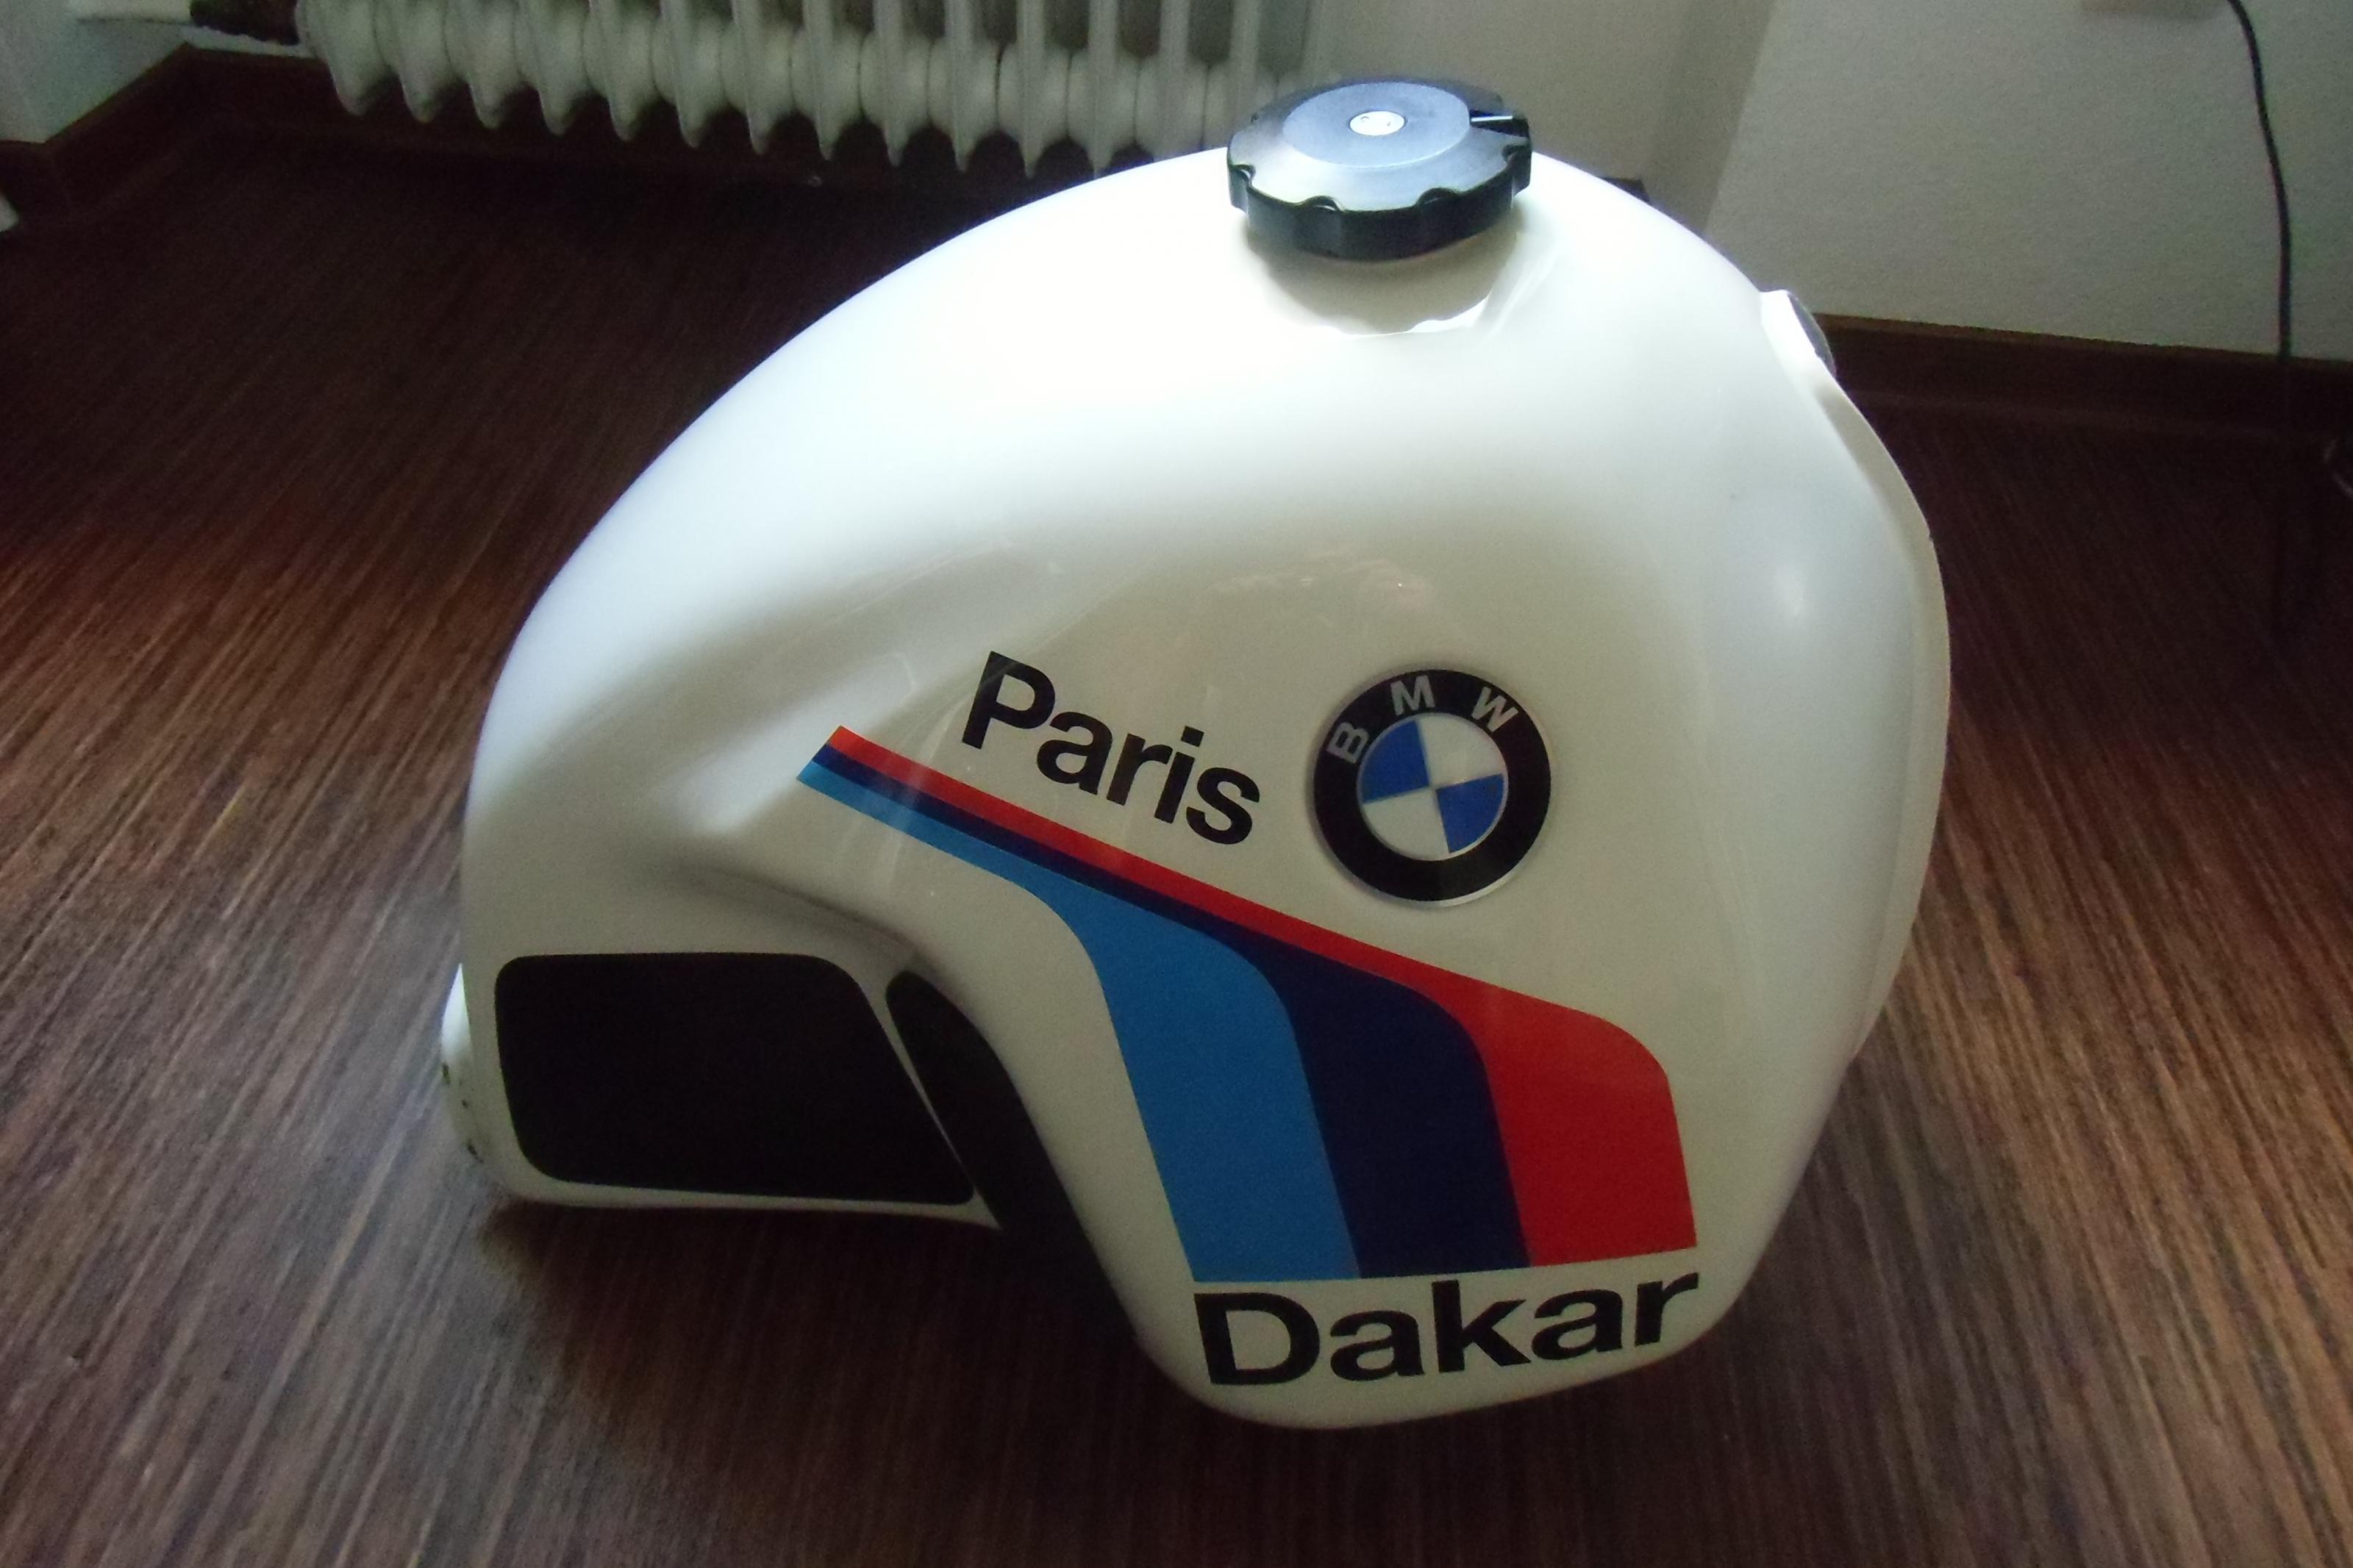 Paris Dakar Tank 32ltr